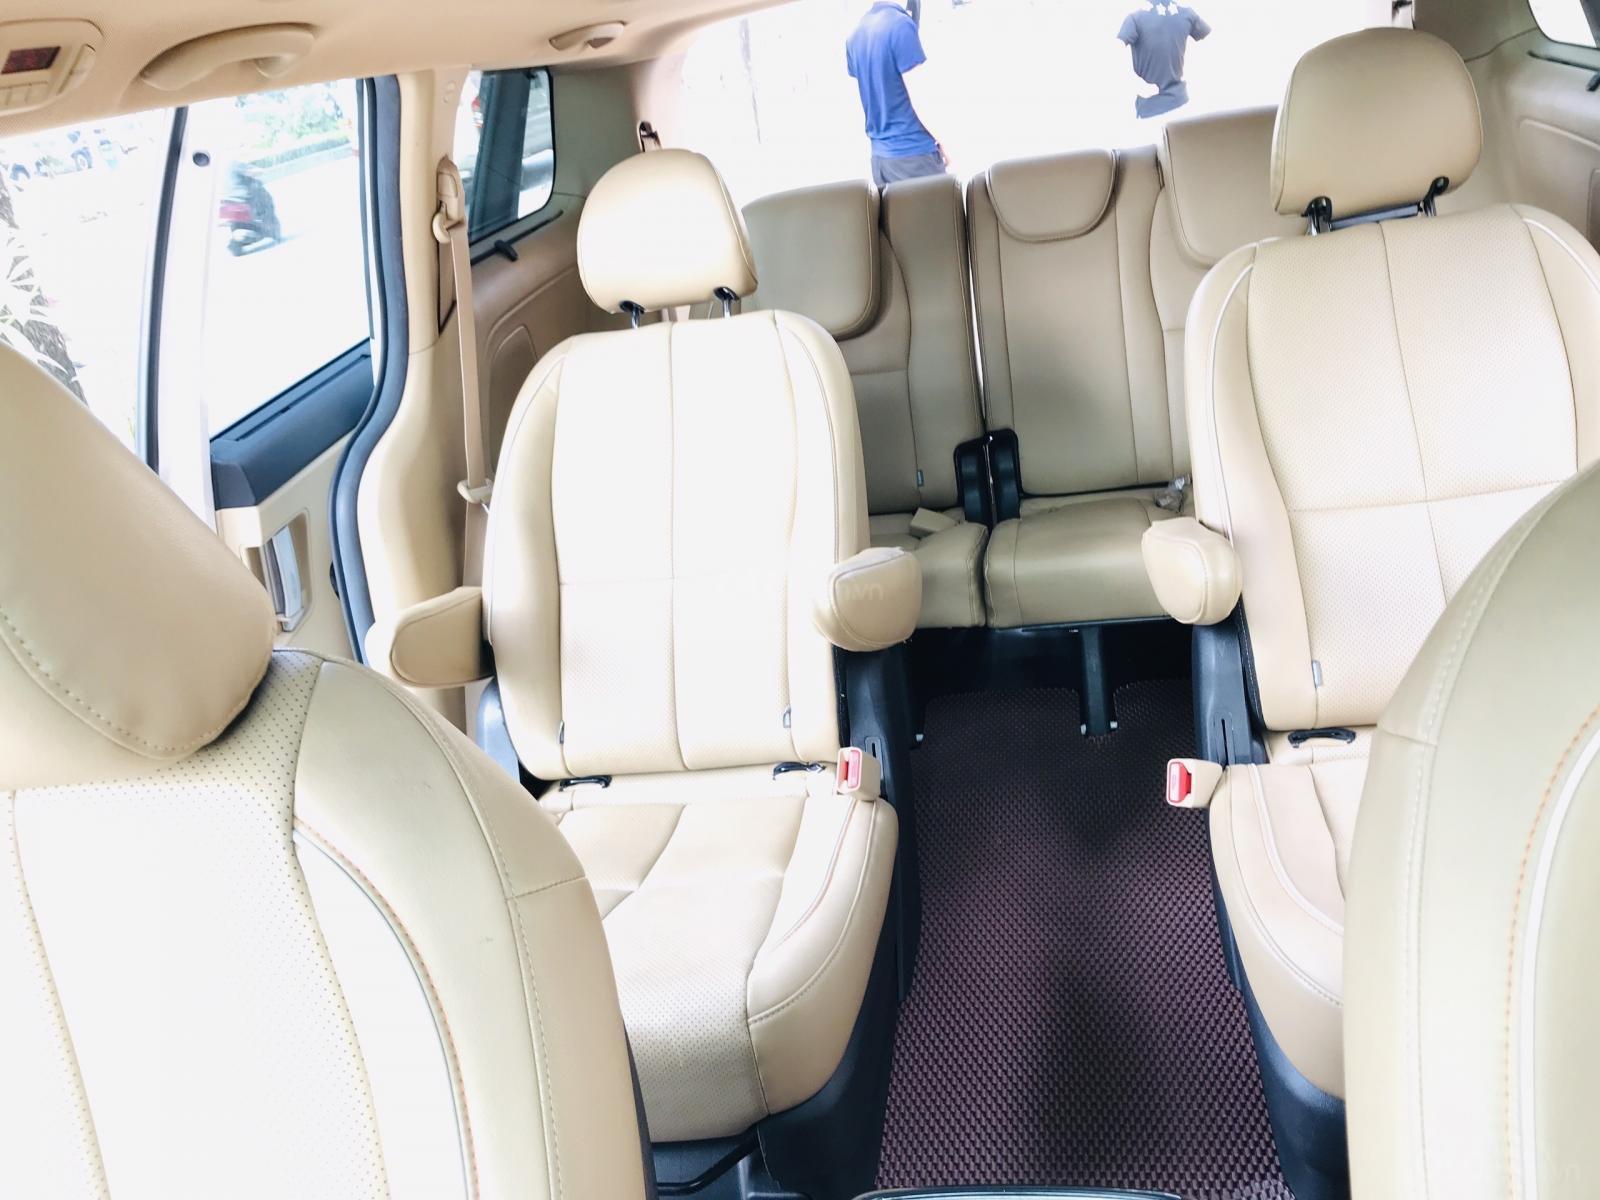 Kia Grand Sedona CRDI modo 2018, máy dầu bản cao cấp nhất, phun kịch option (24)